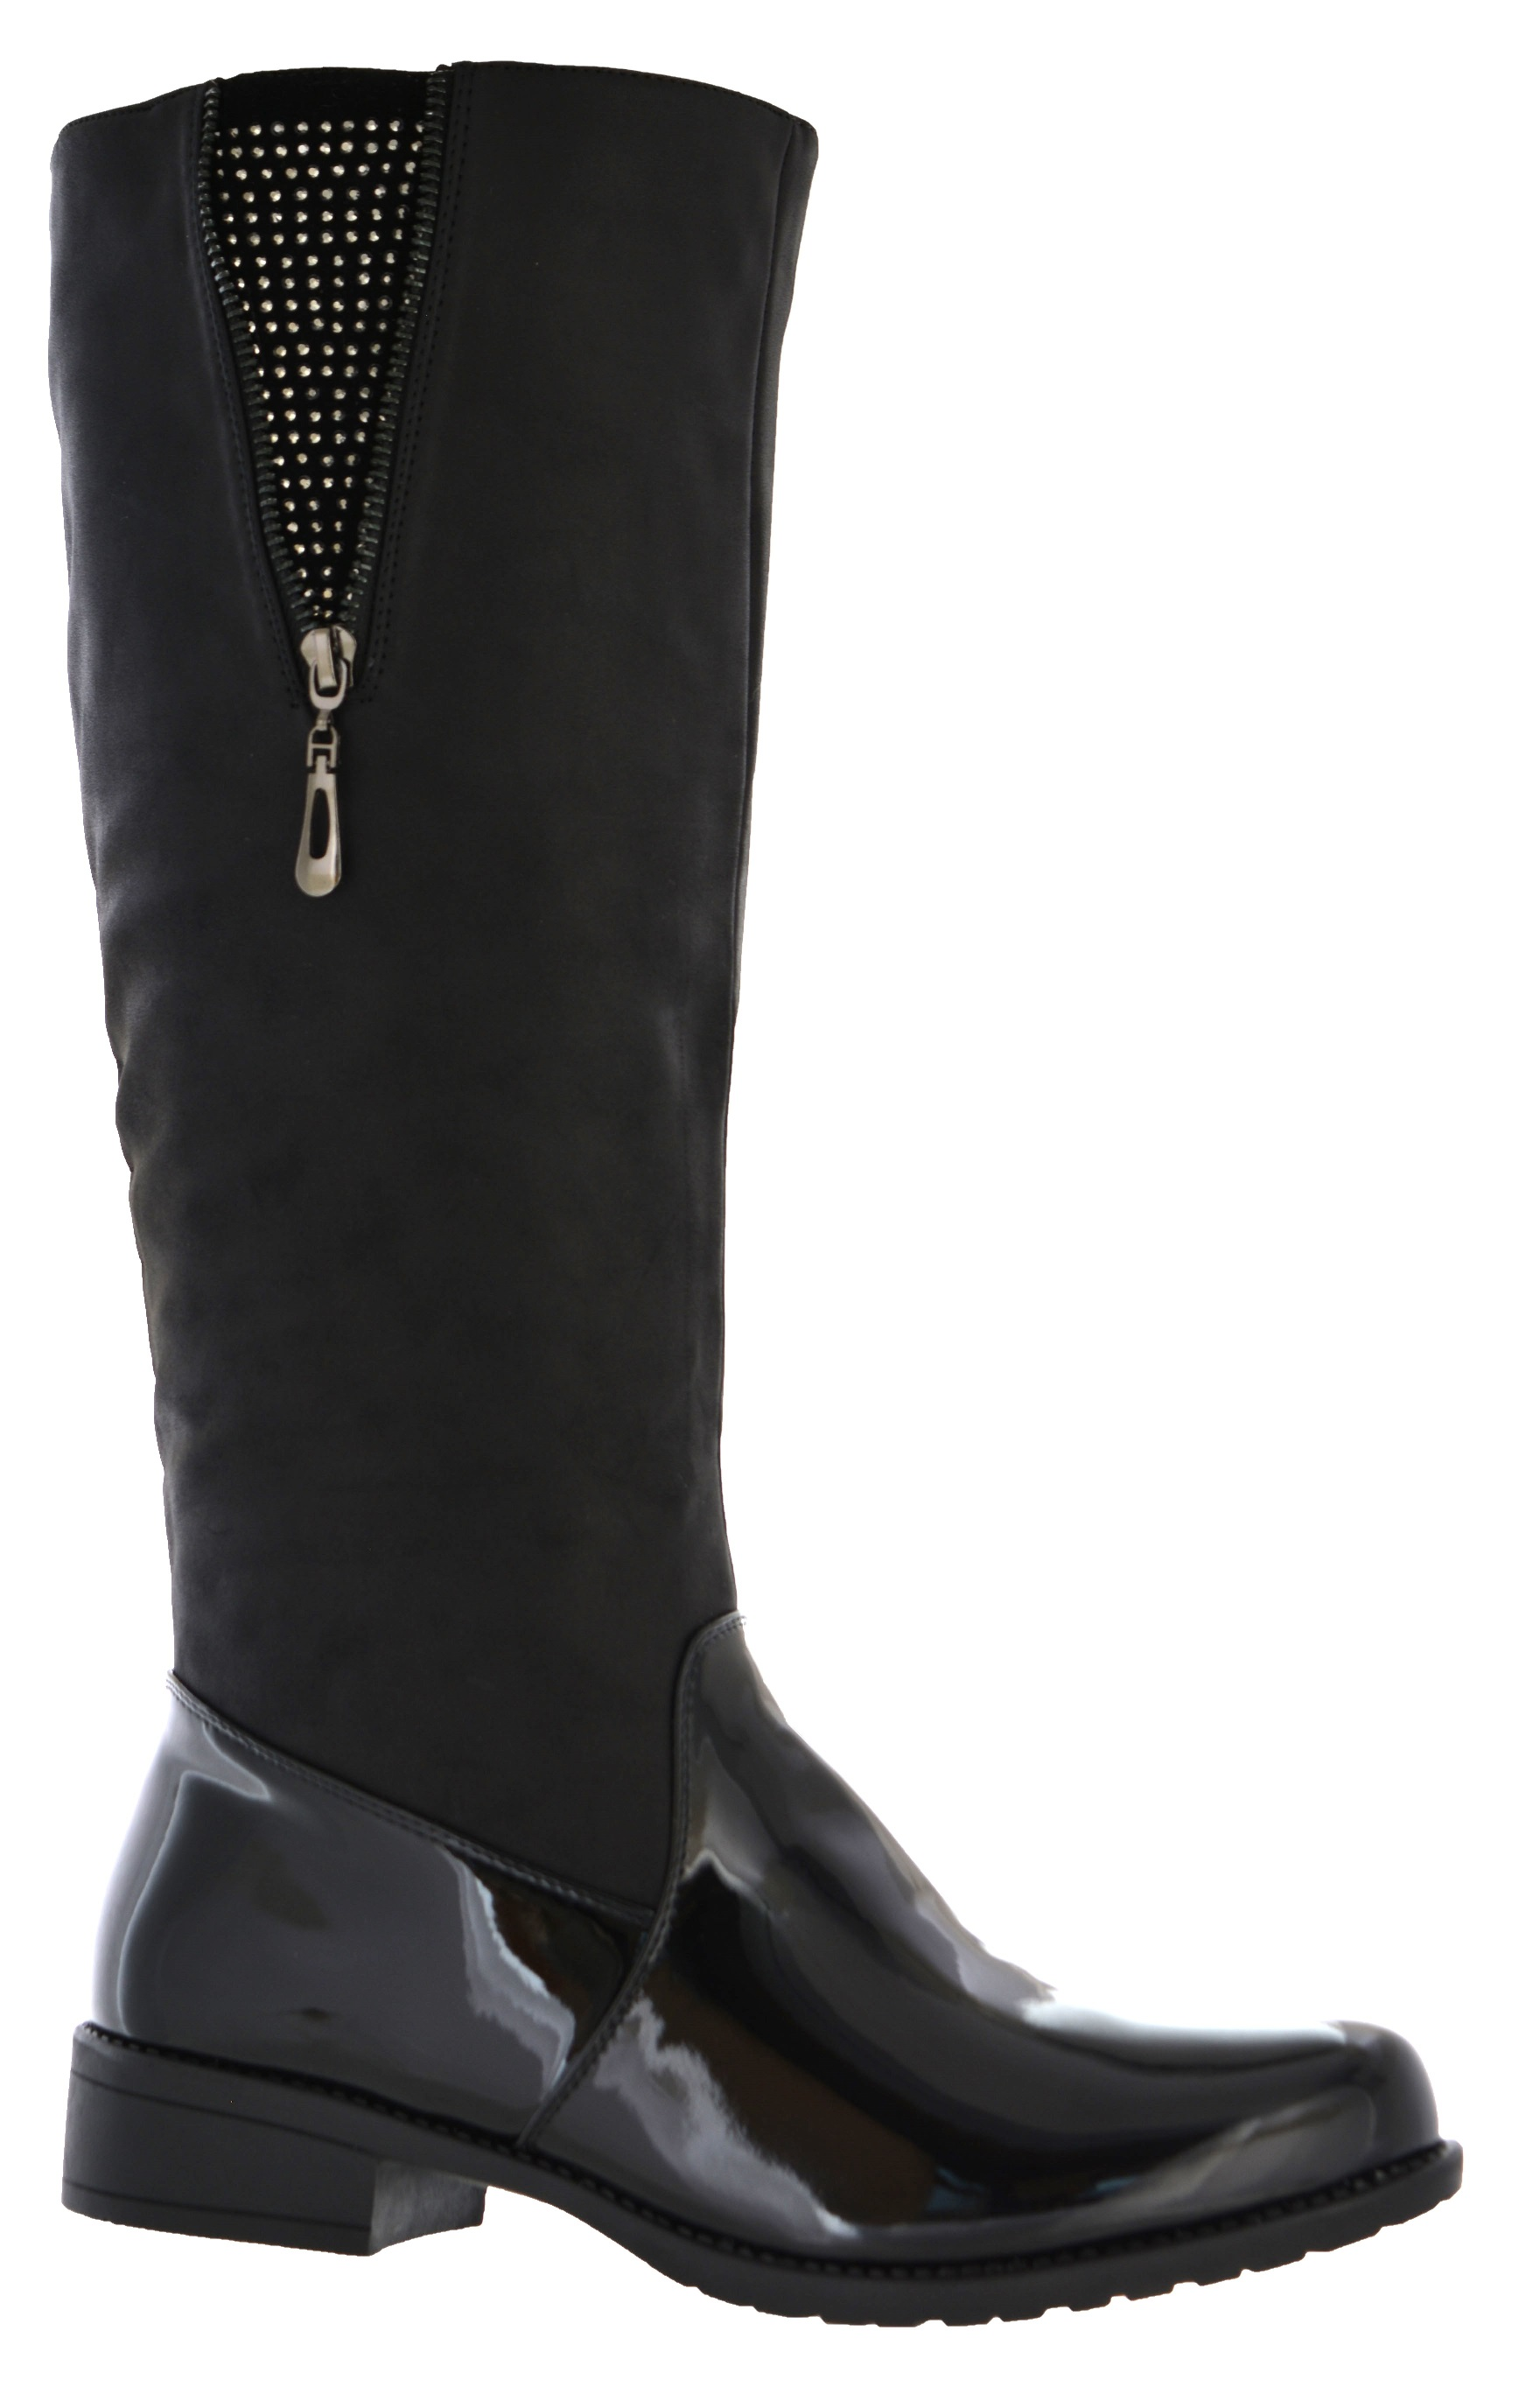 Creative New Womens Knee High Riding Boots Zipper U0026 Buckle Strap Fashion Tan Brown Black | EBay